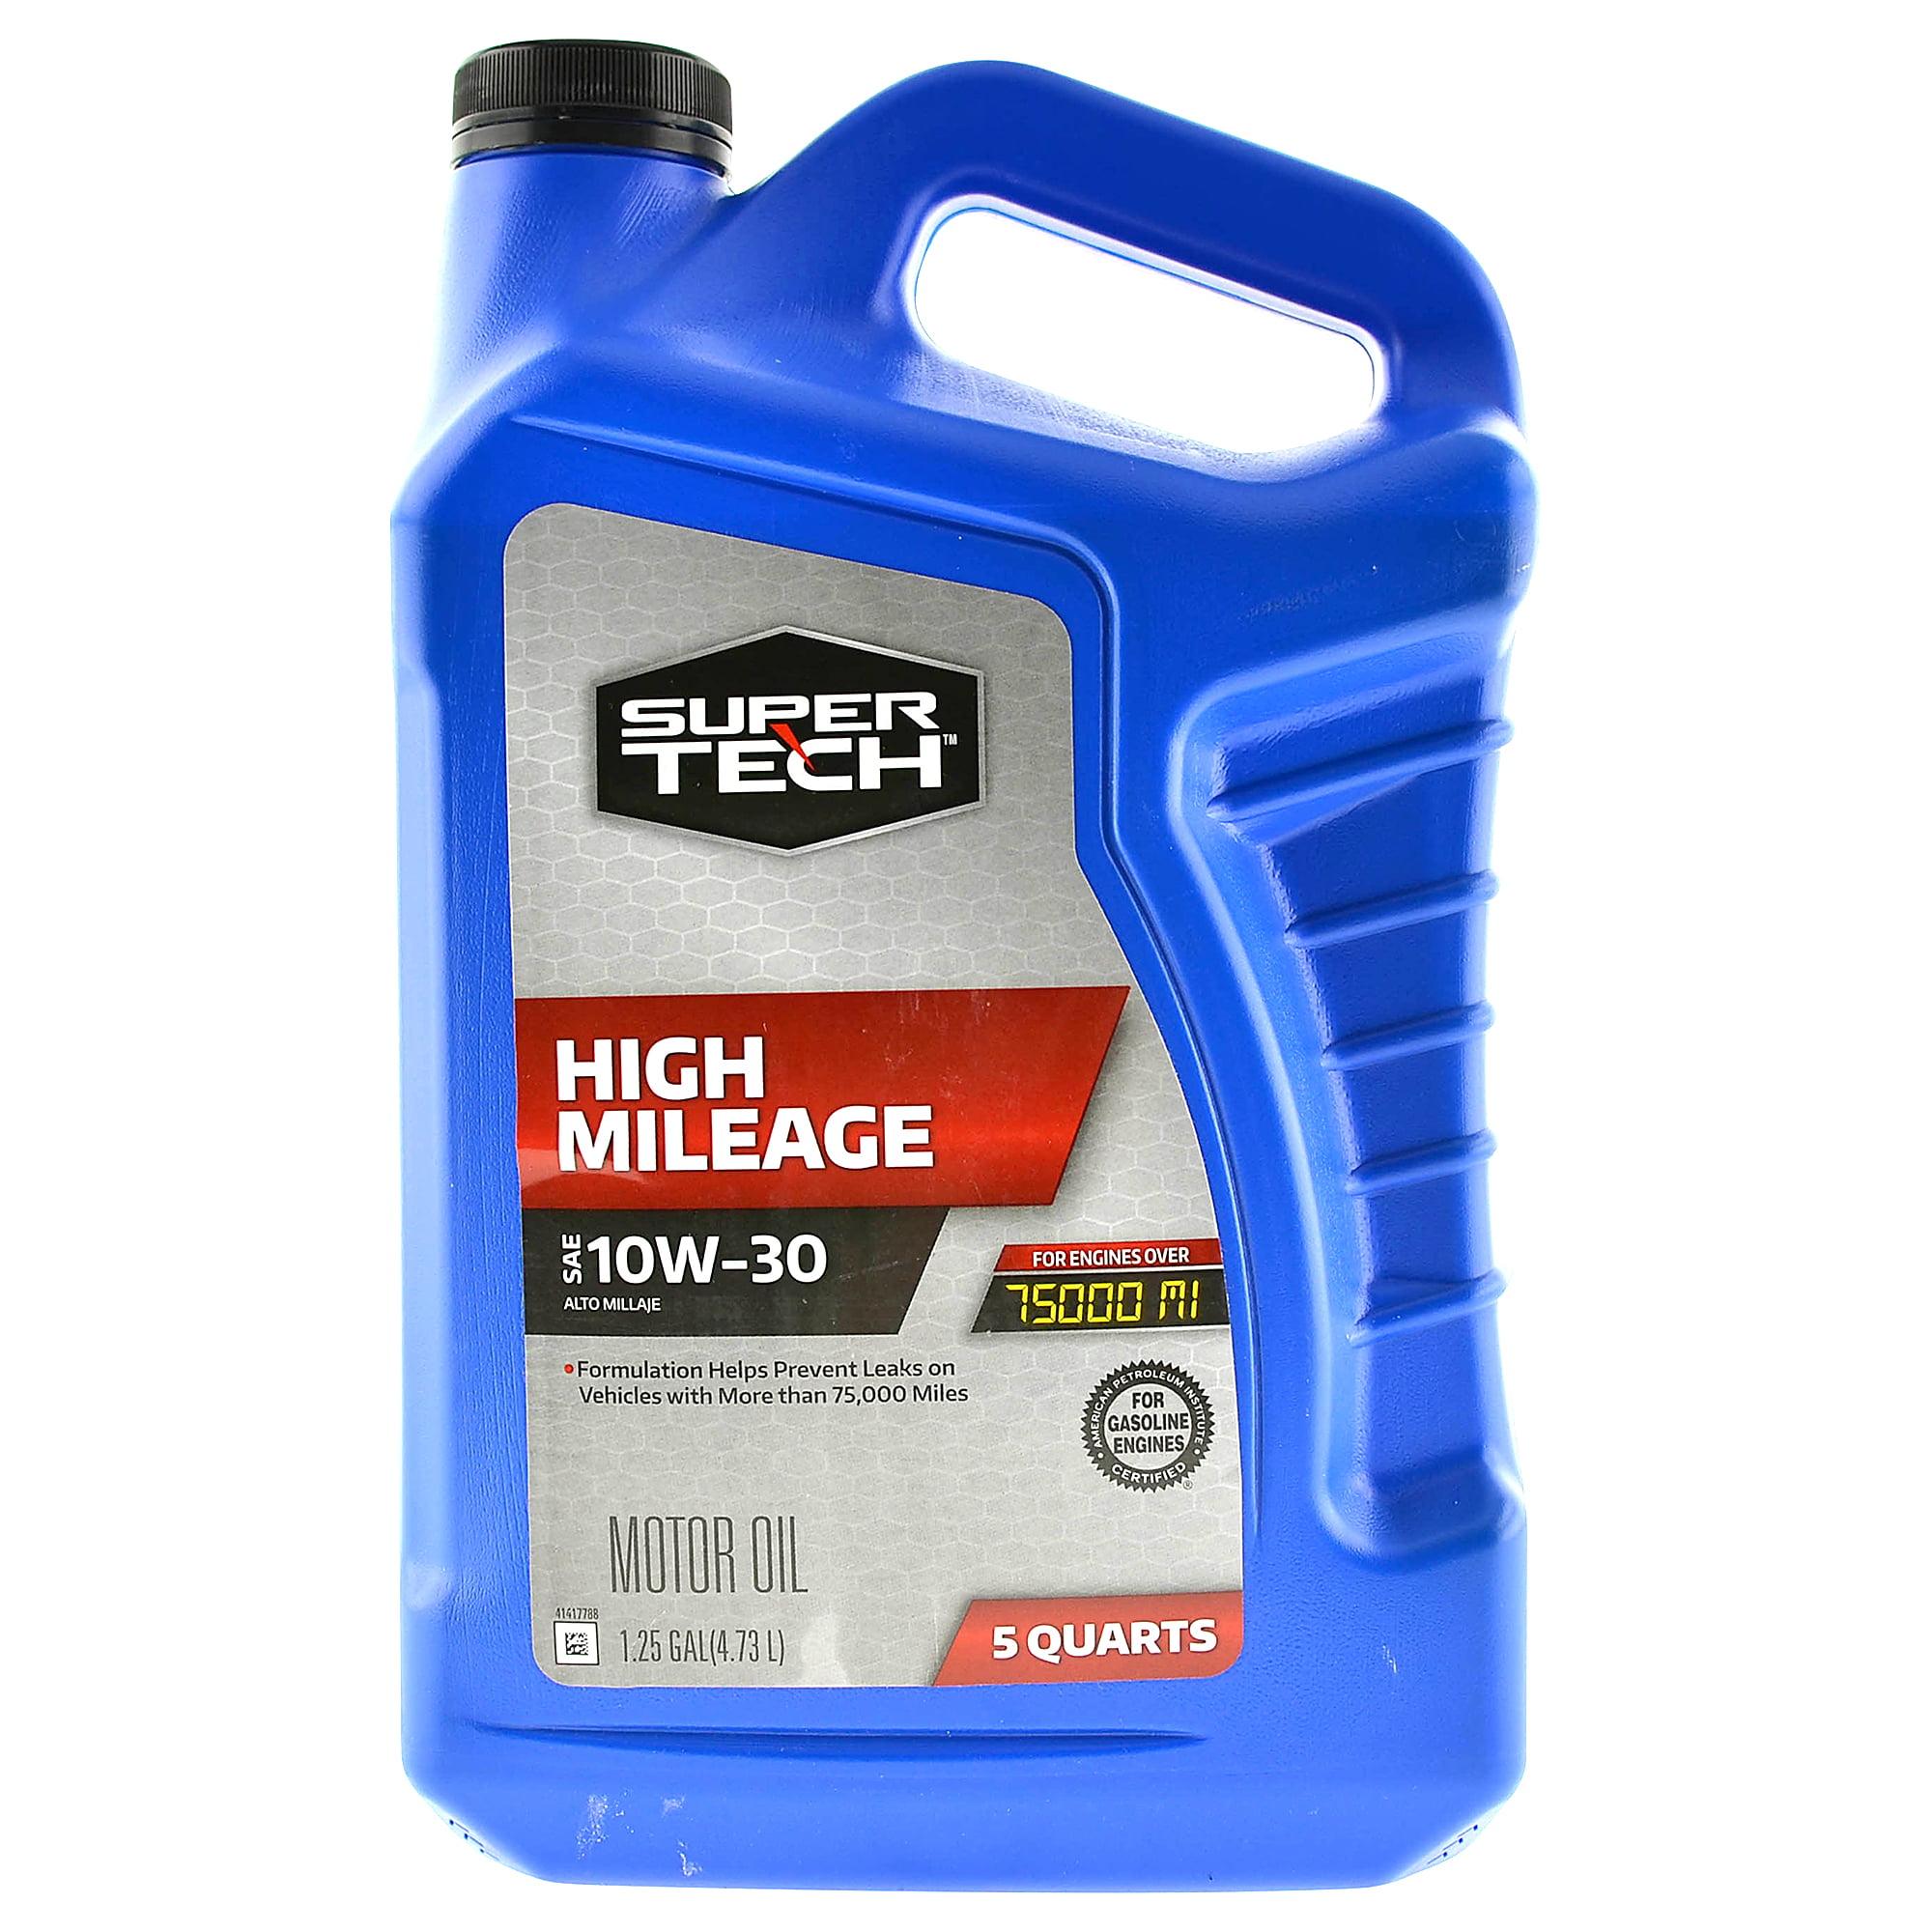 Super Tech High Mileage SAE 10W-30 Motor Oil, 5 Quarts